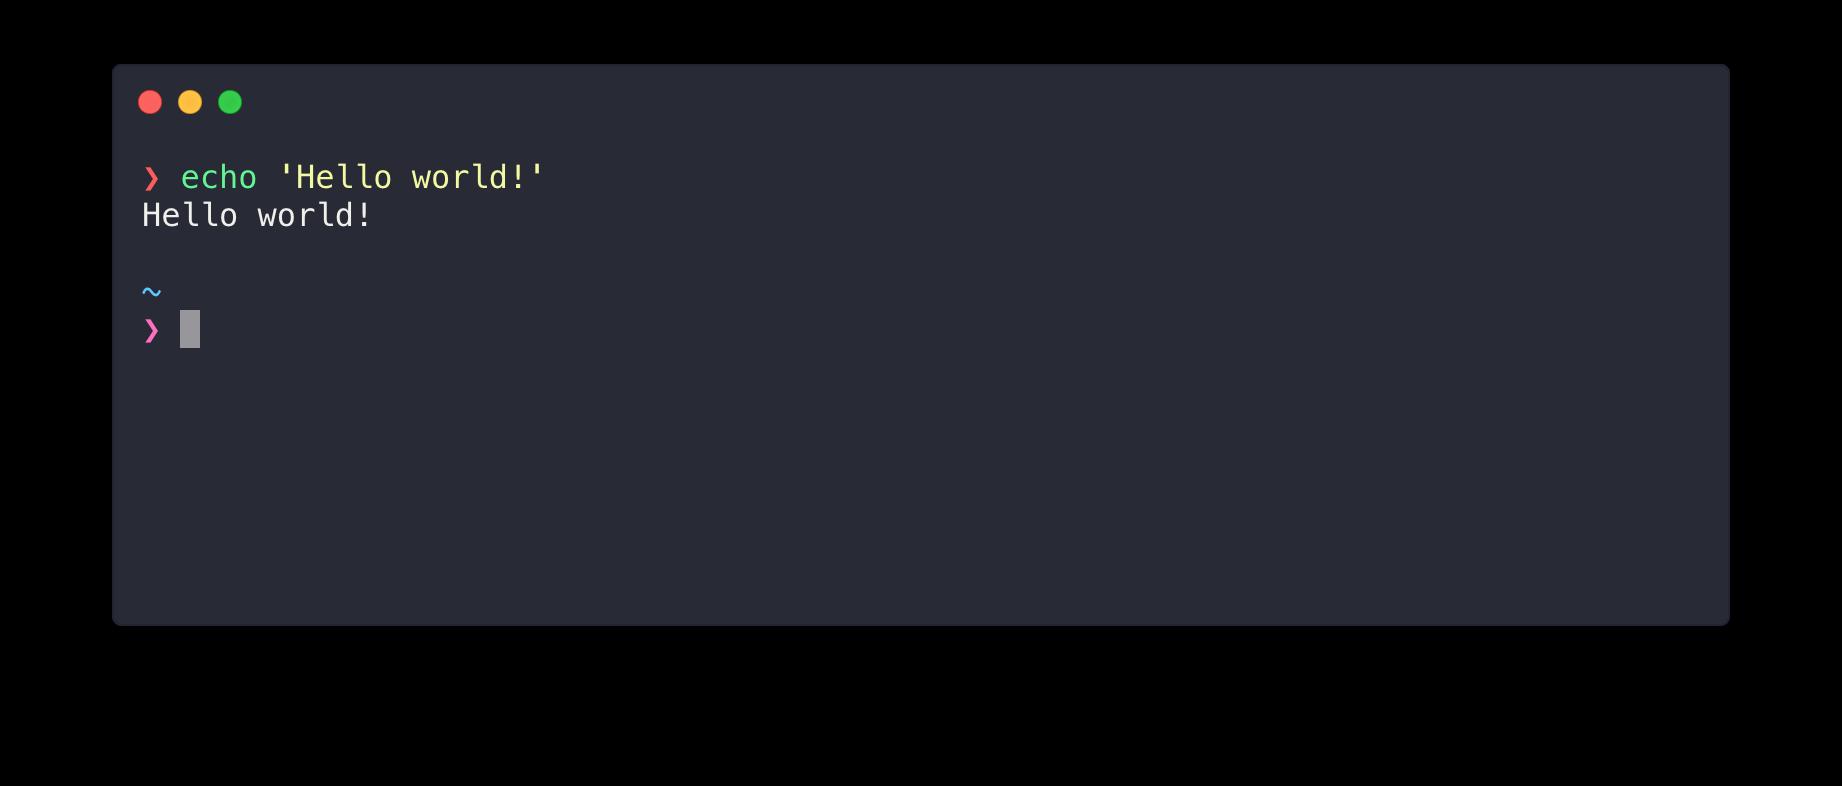 GitHub - cesarferreira/lgtv-cli: CLI to control LG TV with WebOS